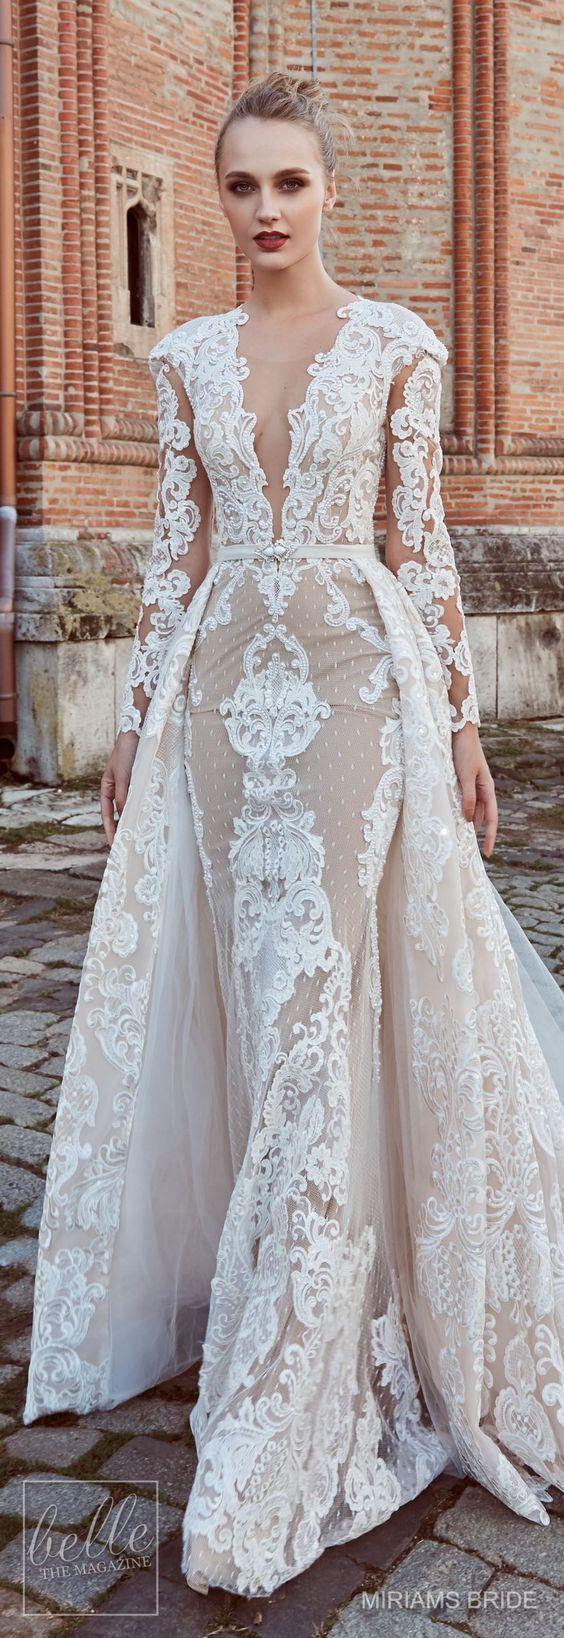 Wedding dress by miriams bride collection weddingdress